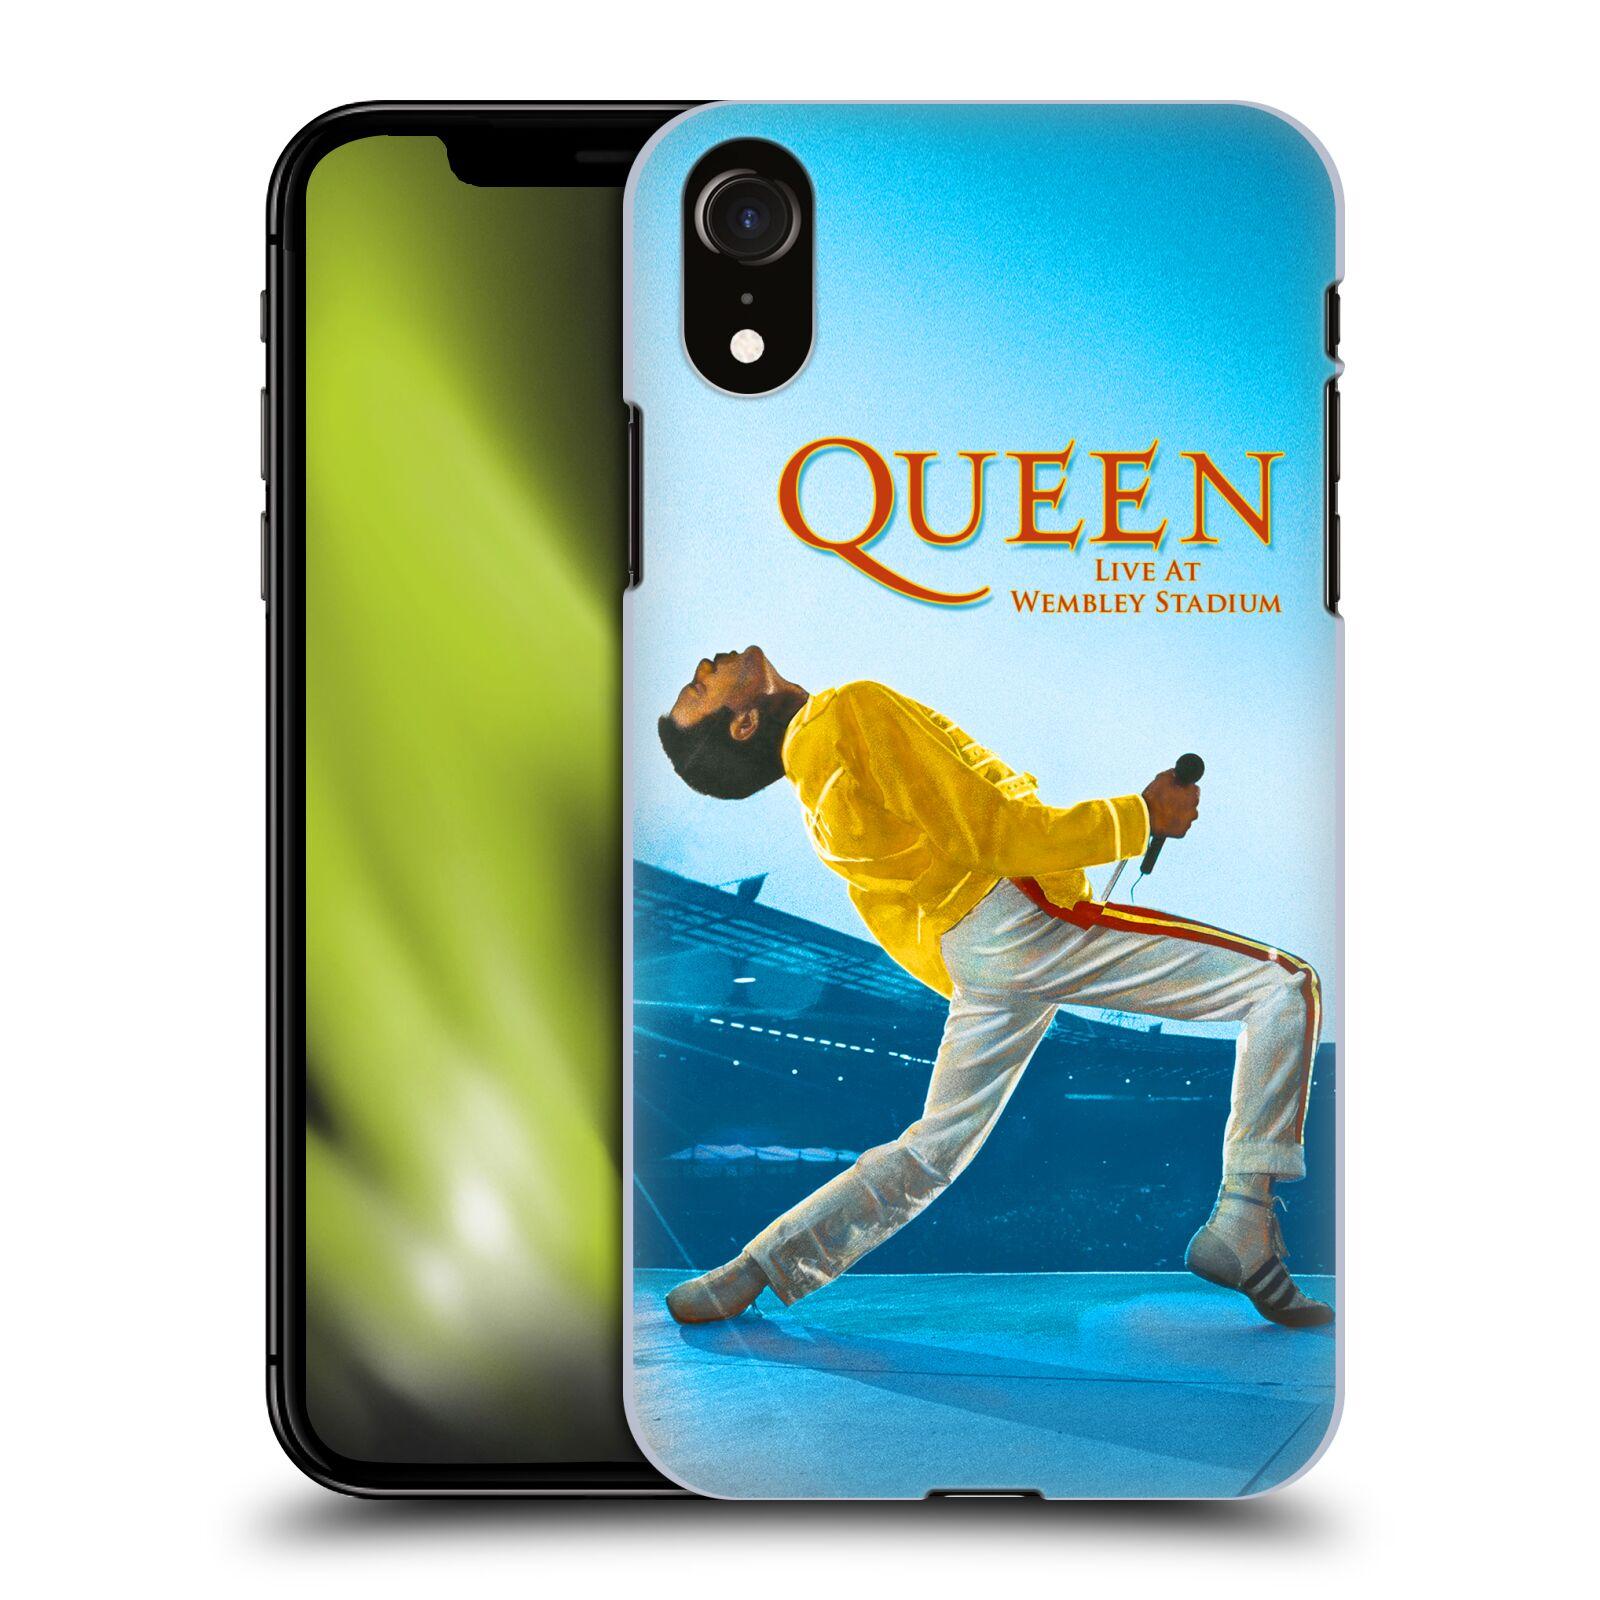 Plastové pouzdro na mobil Apple iPhone XR - Head Case - Queen - Freddie Mercury